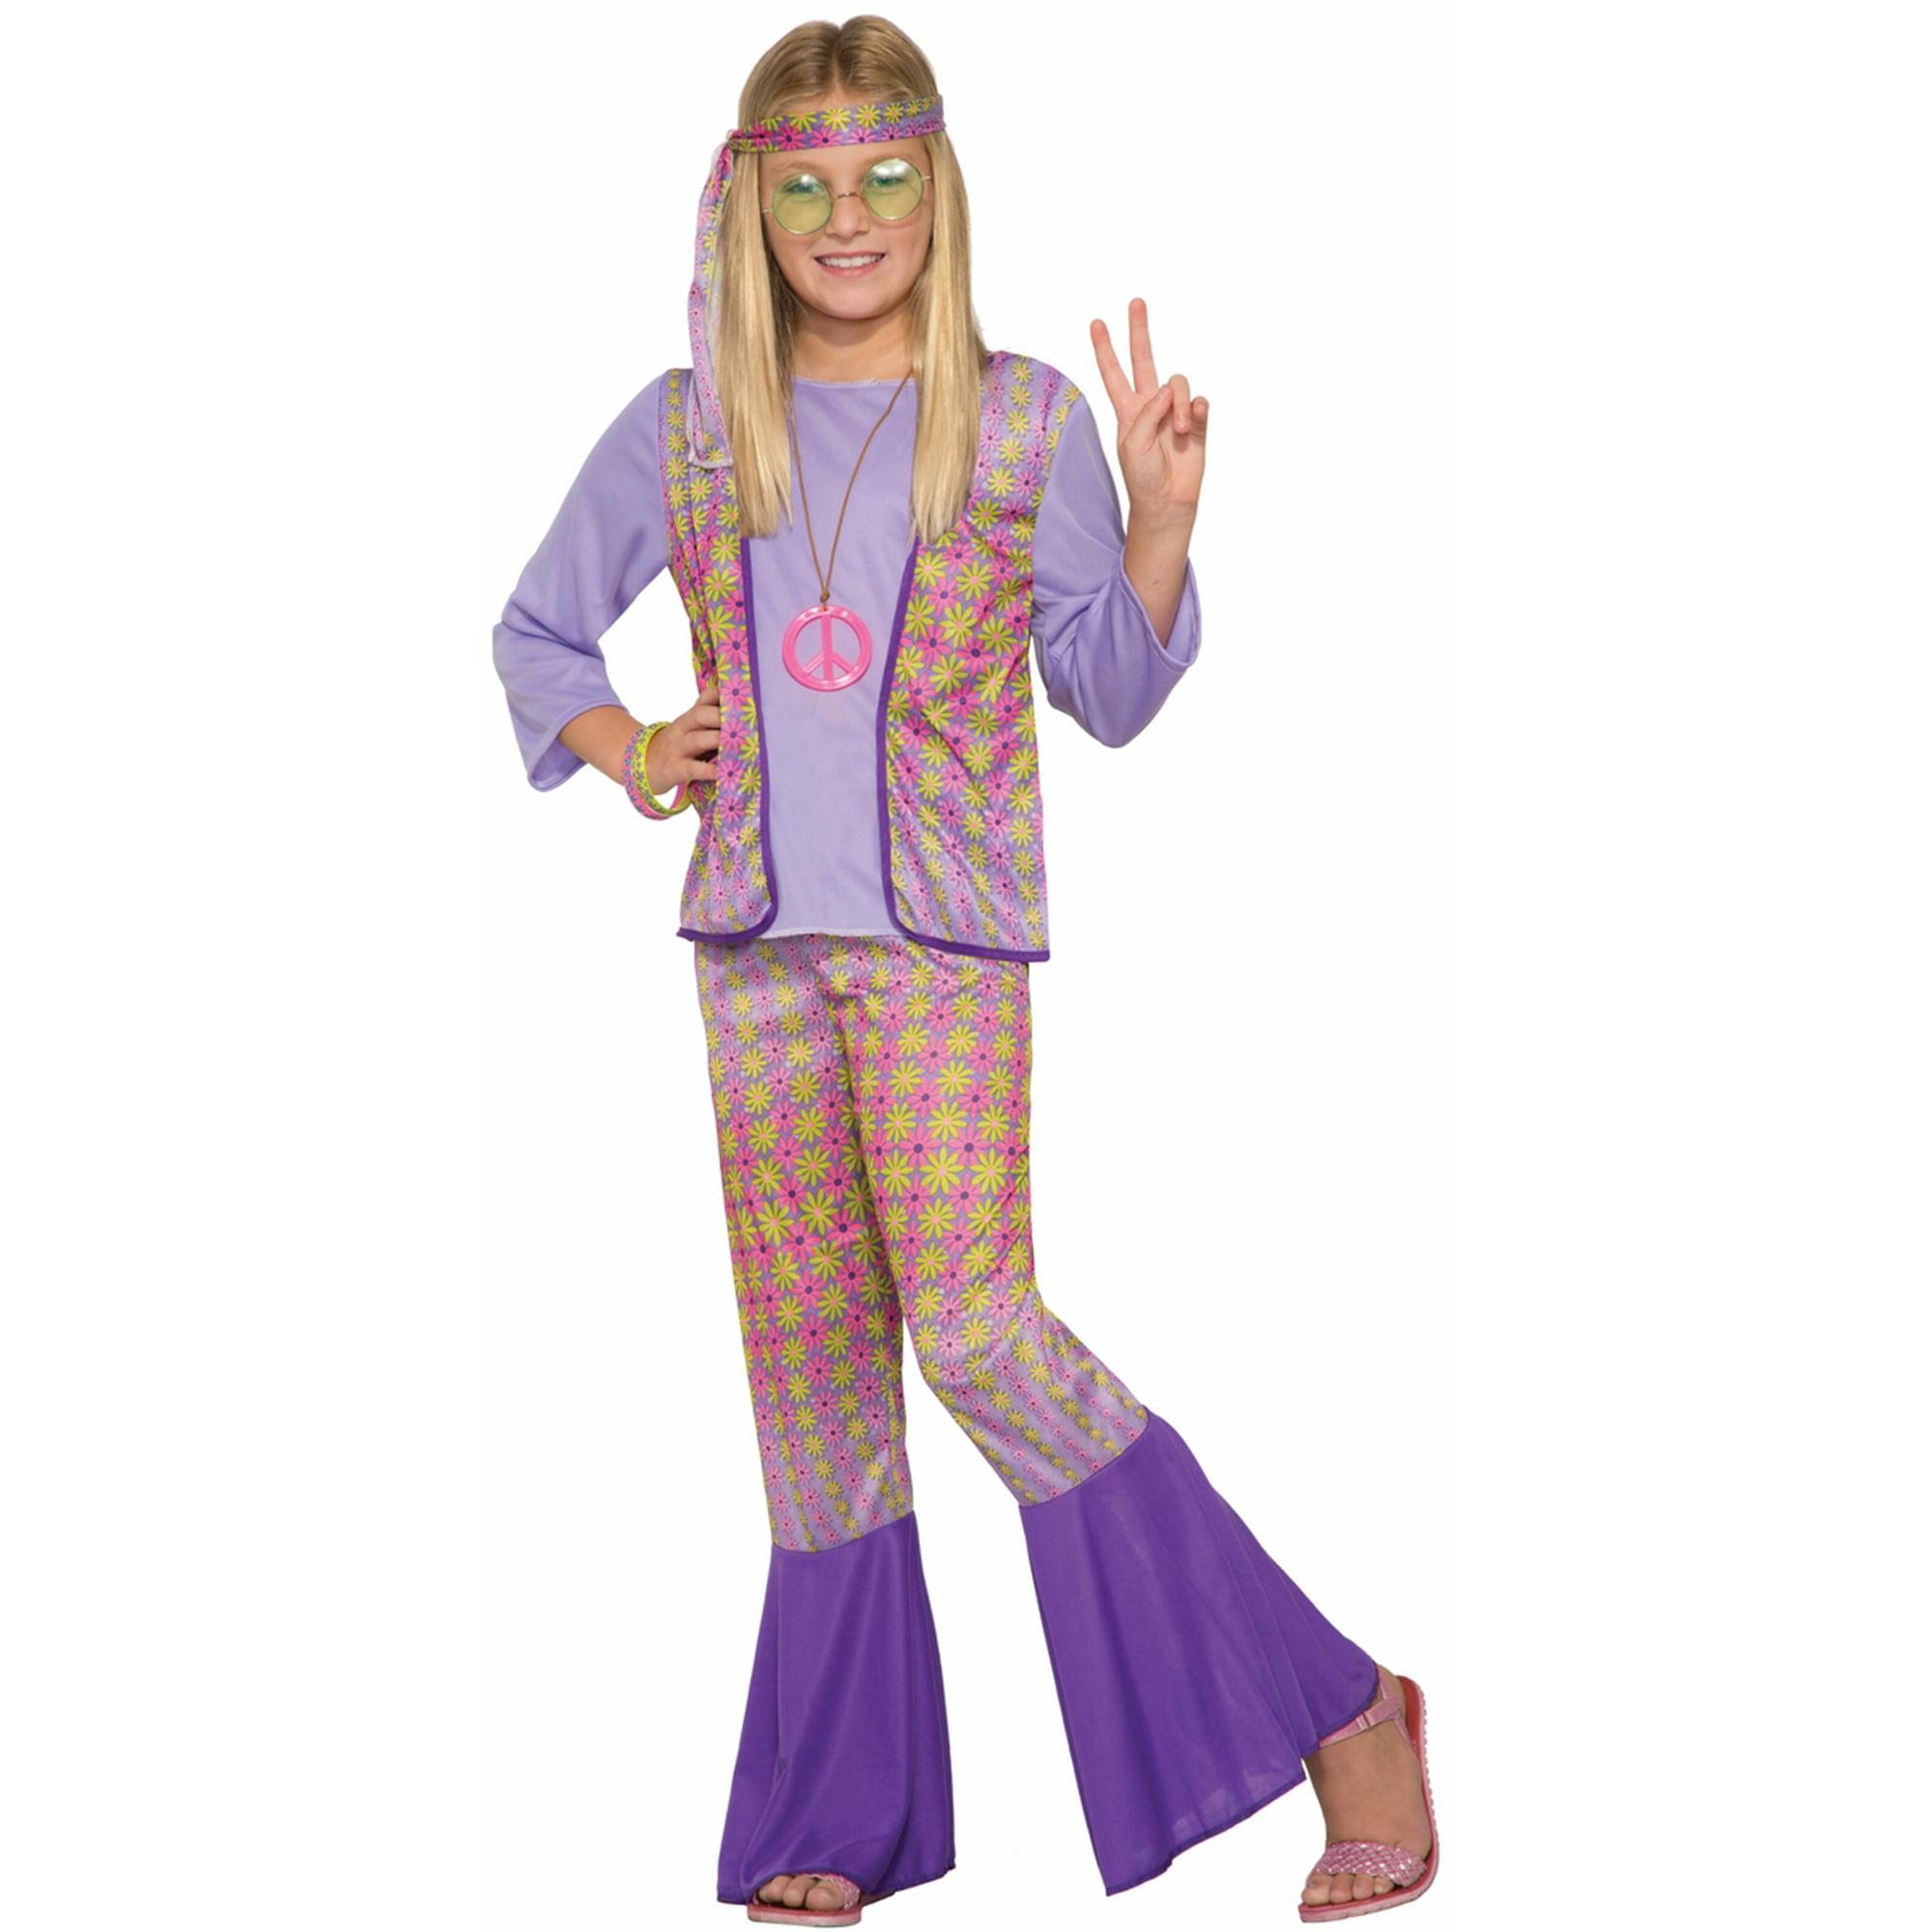 Hippie Girl Halloween Costume.Generation Hippie Love Child Girls Halloween Costume 1970s Flower Power Sm Md Lg